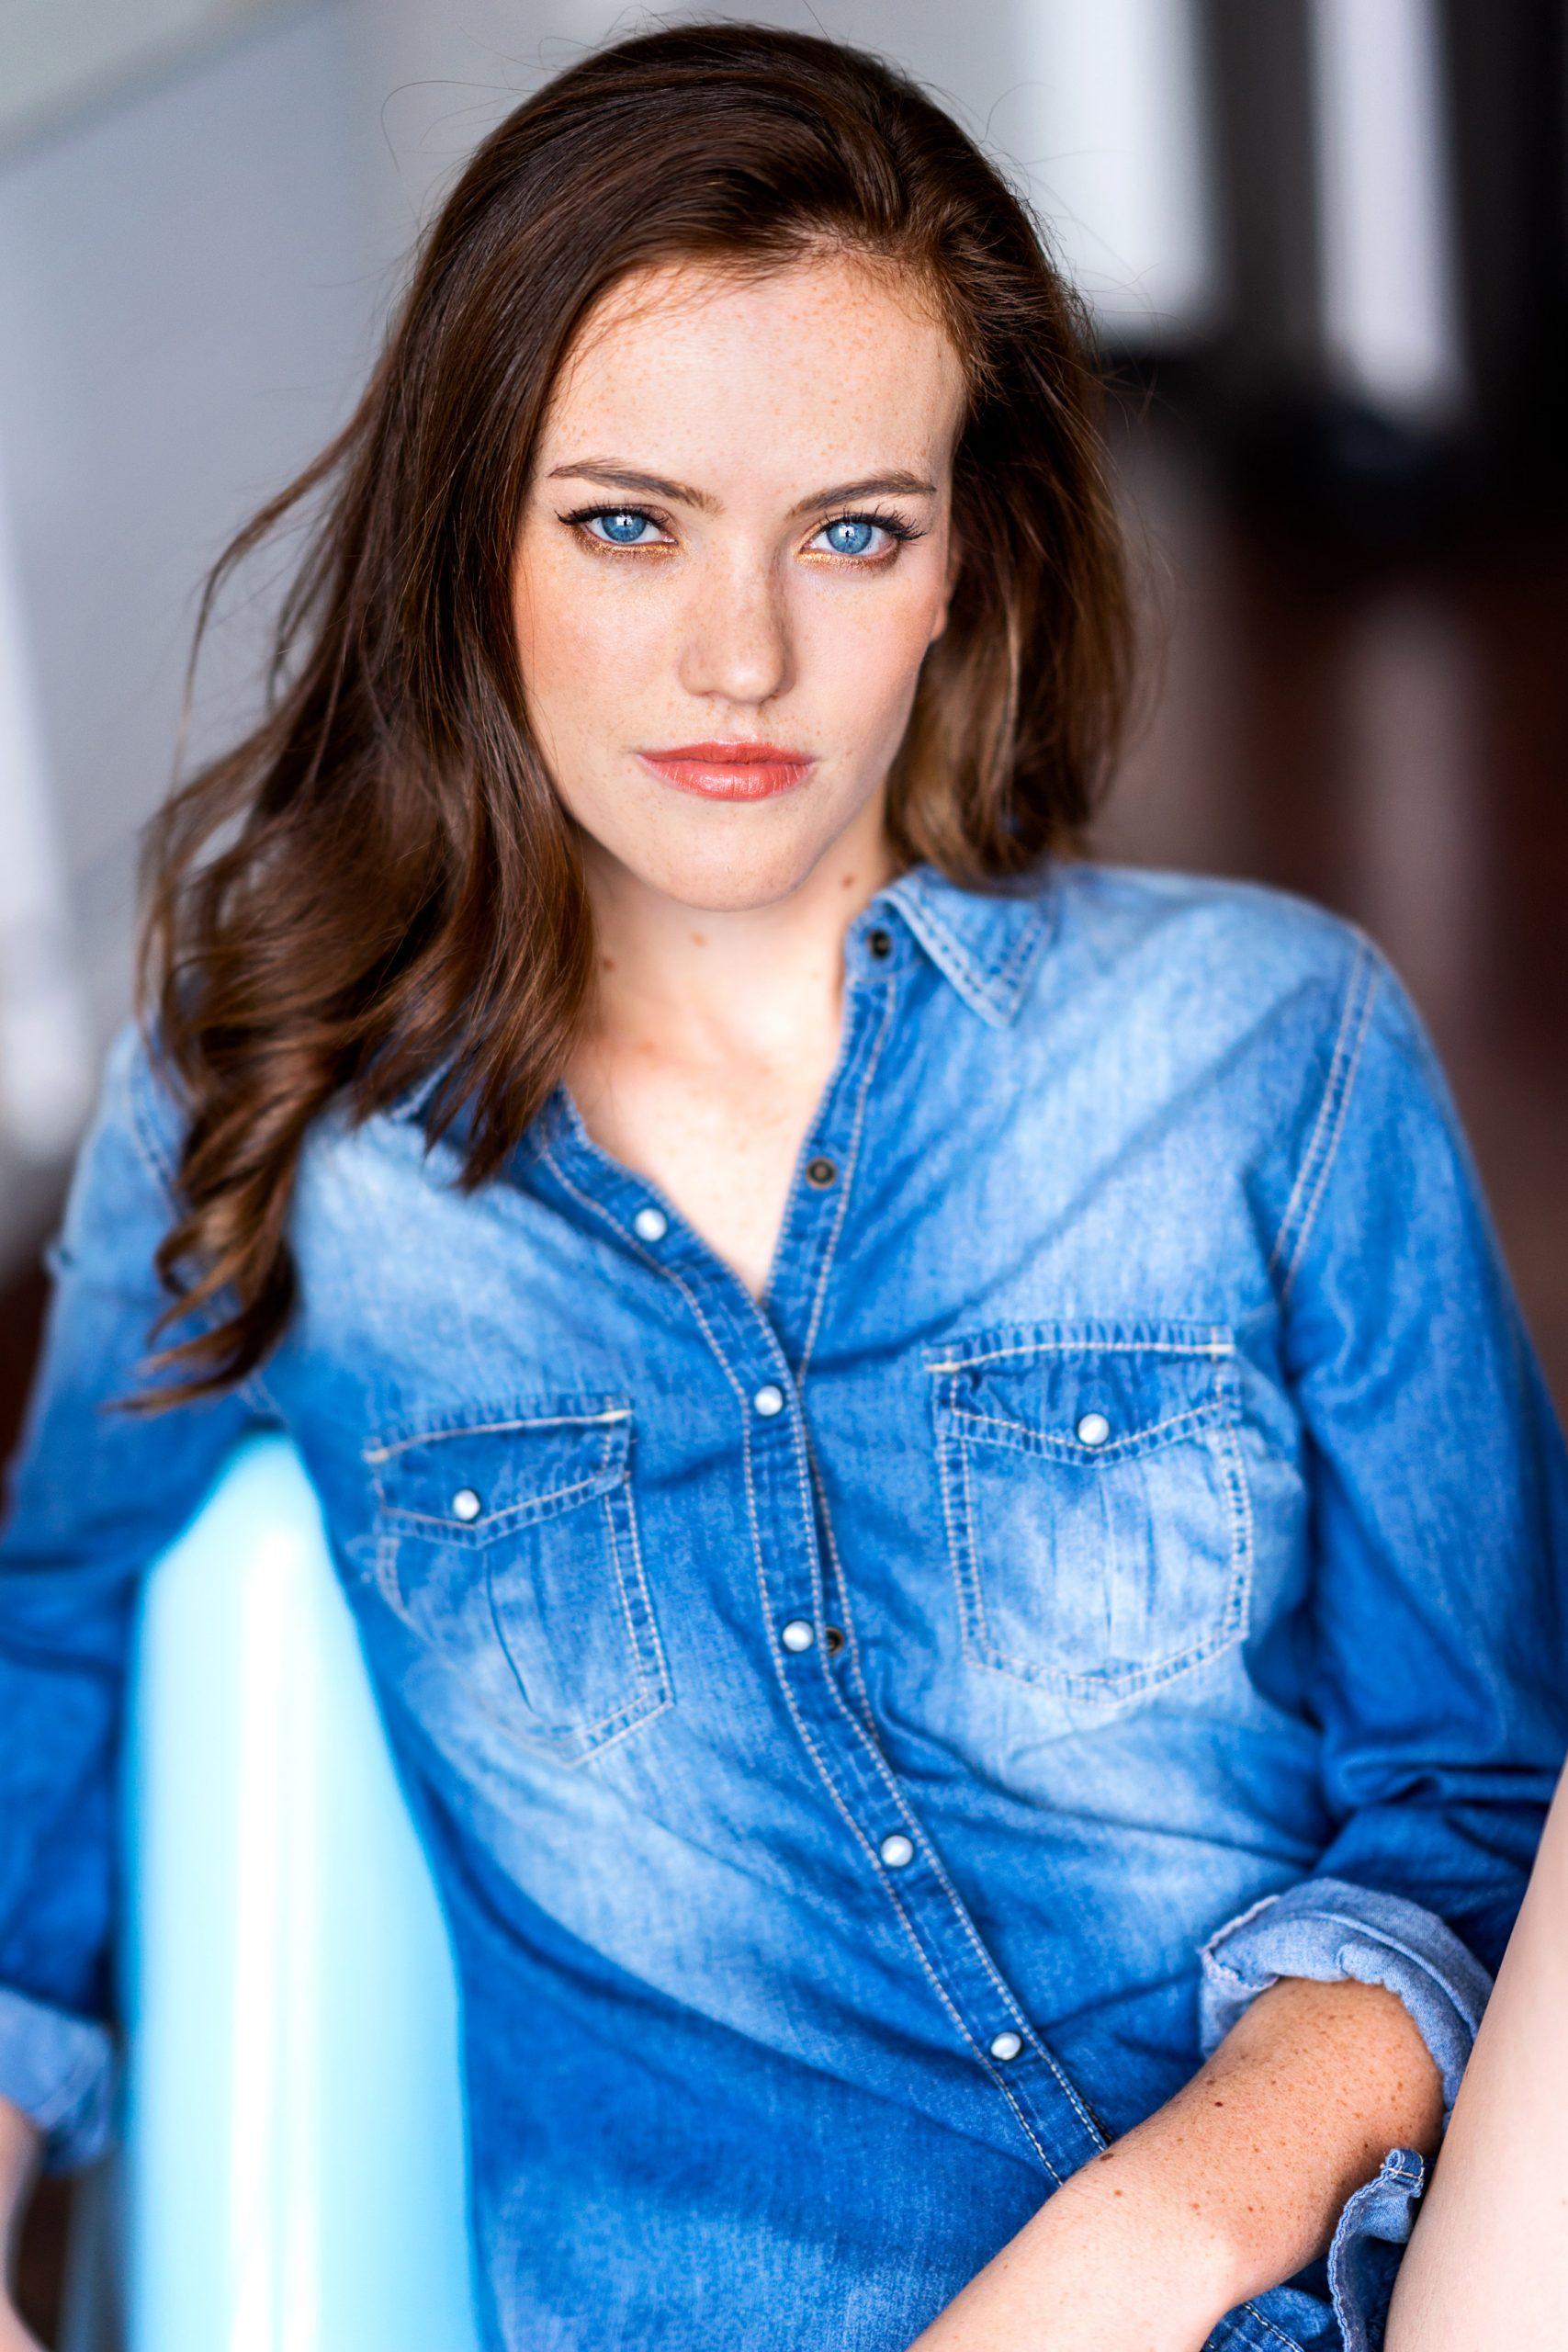 Dallas Model Test Shoot Lifestyle Photoshoot Sabrina Lynn